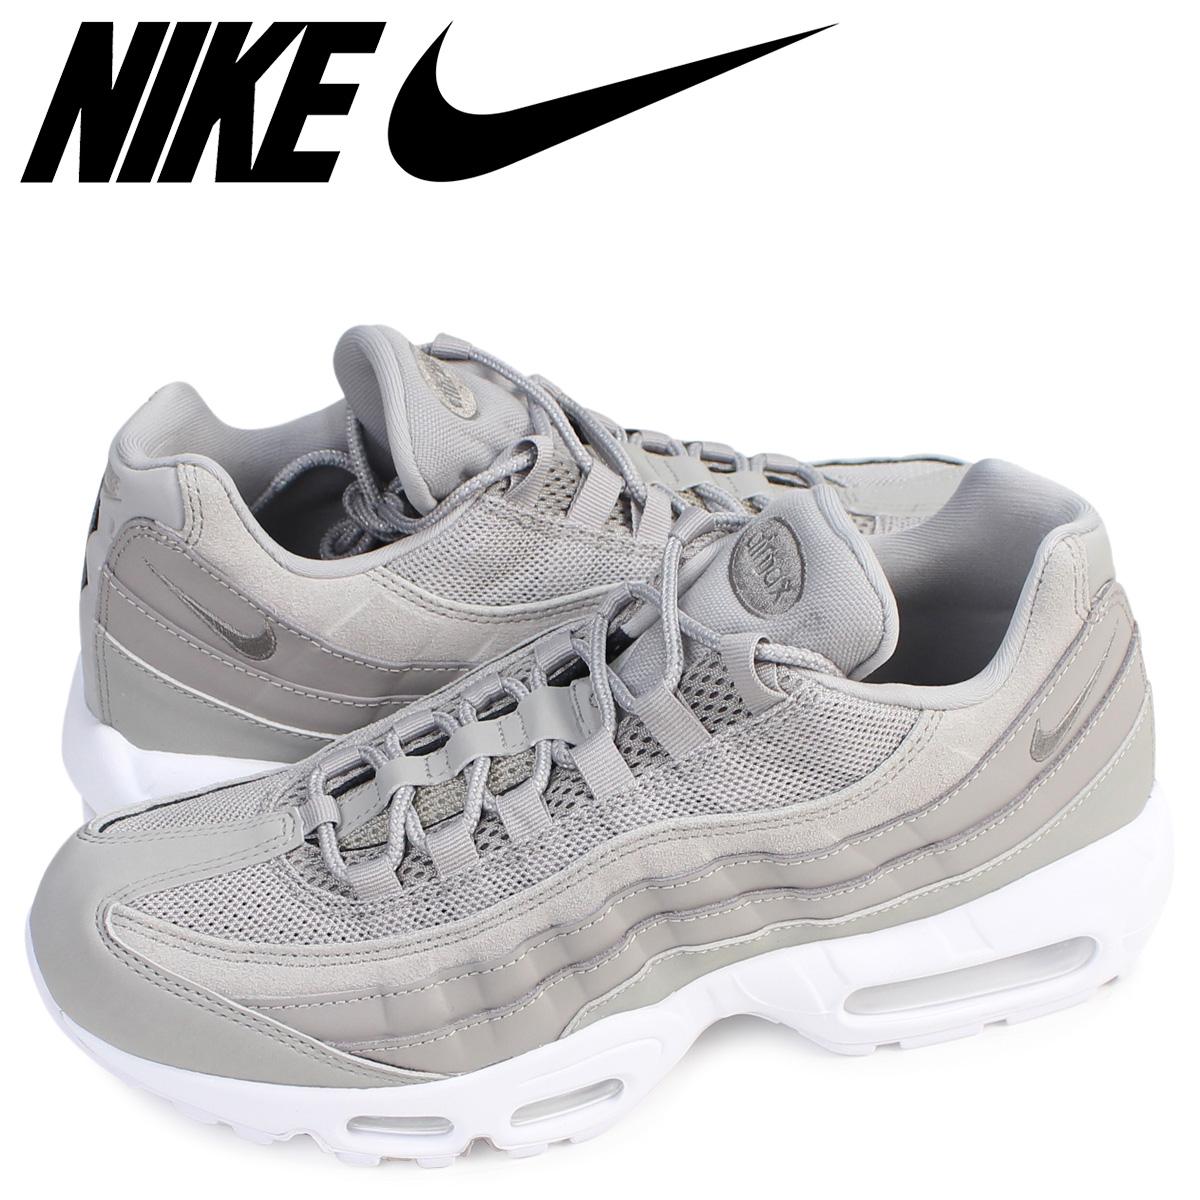 uk availability 9c789 3ad95 Whats up Sports: Nike NIKE Air Max 95 sneakers AIR MAX 95 PREMIUM 538,416- 005 men's shoes gray [8/9 Shinnyu load] | Rakuten Global Market